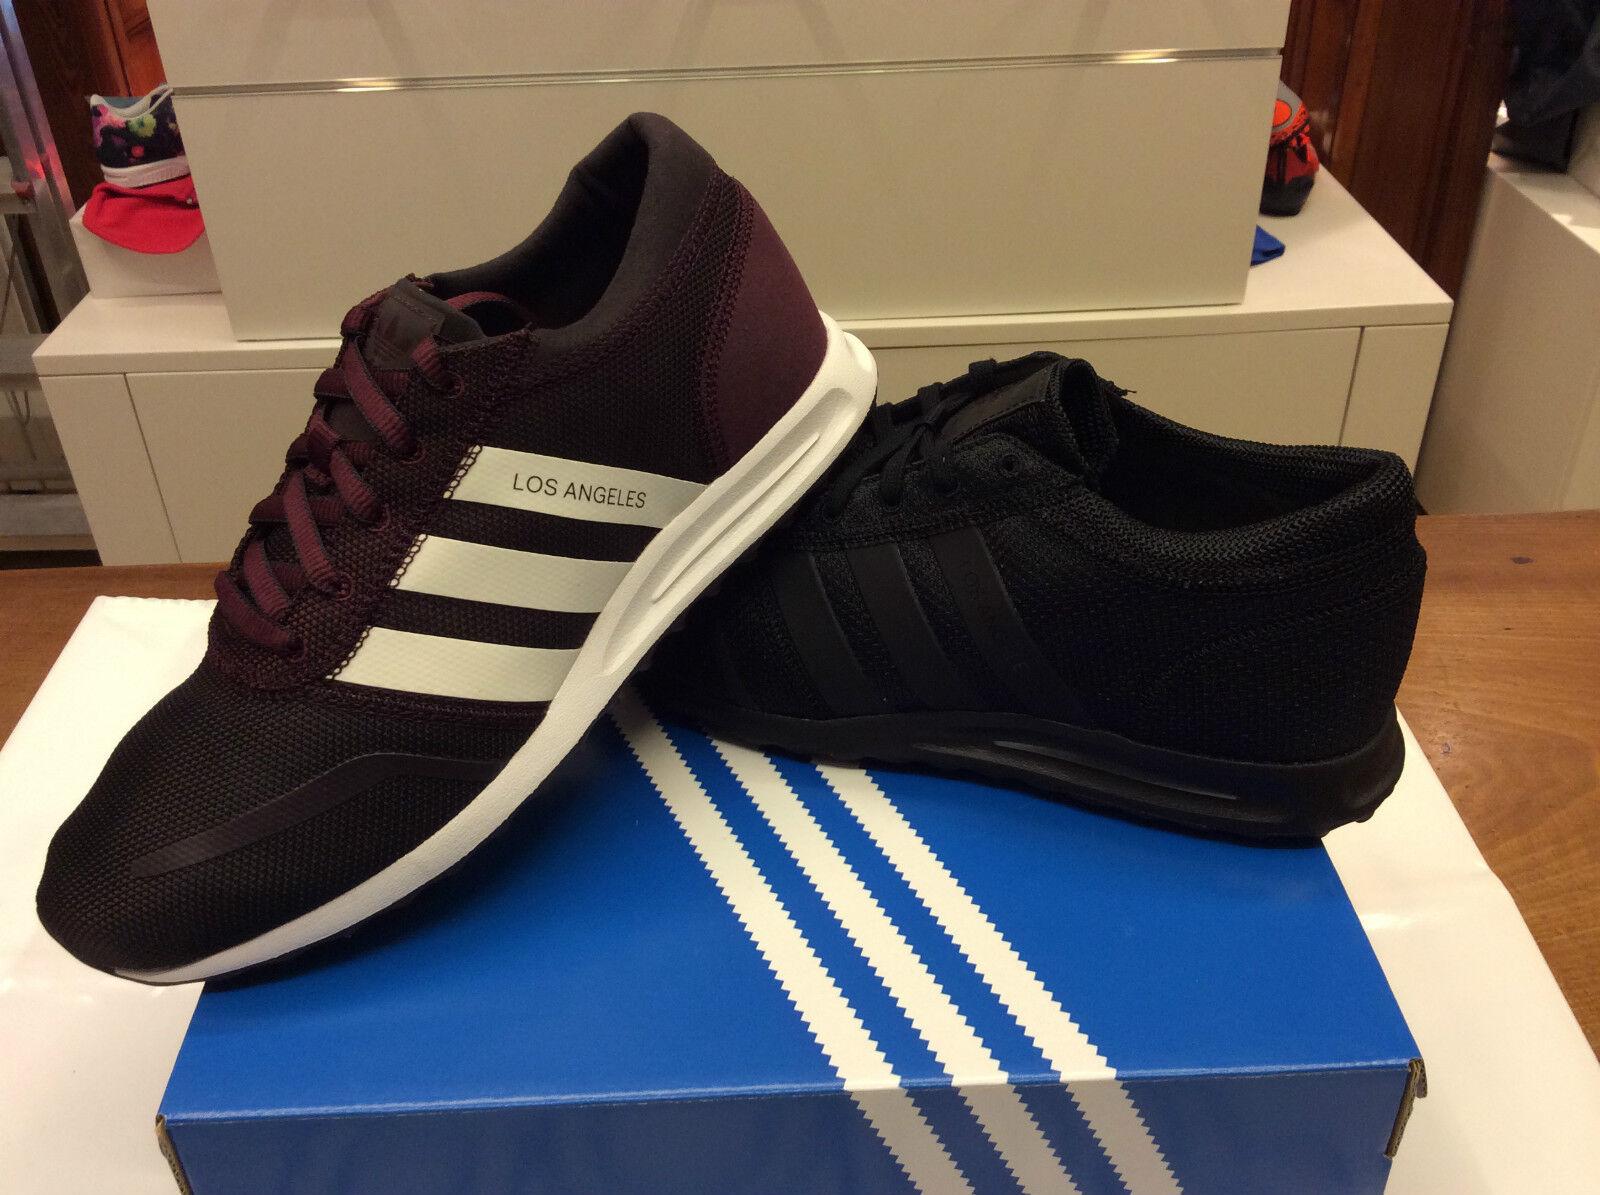 Herren Schuhe adidas Los Angeles art. S31535 (schwarz) - S75995 (bordeaux)